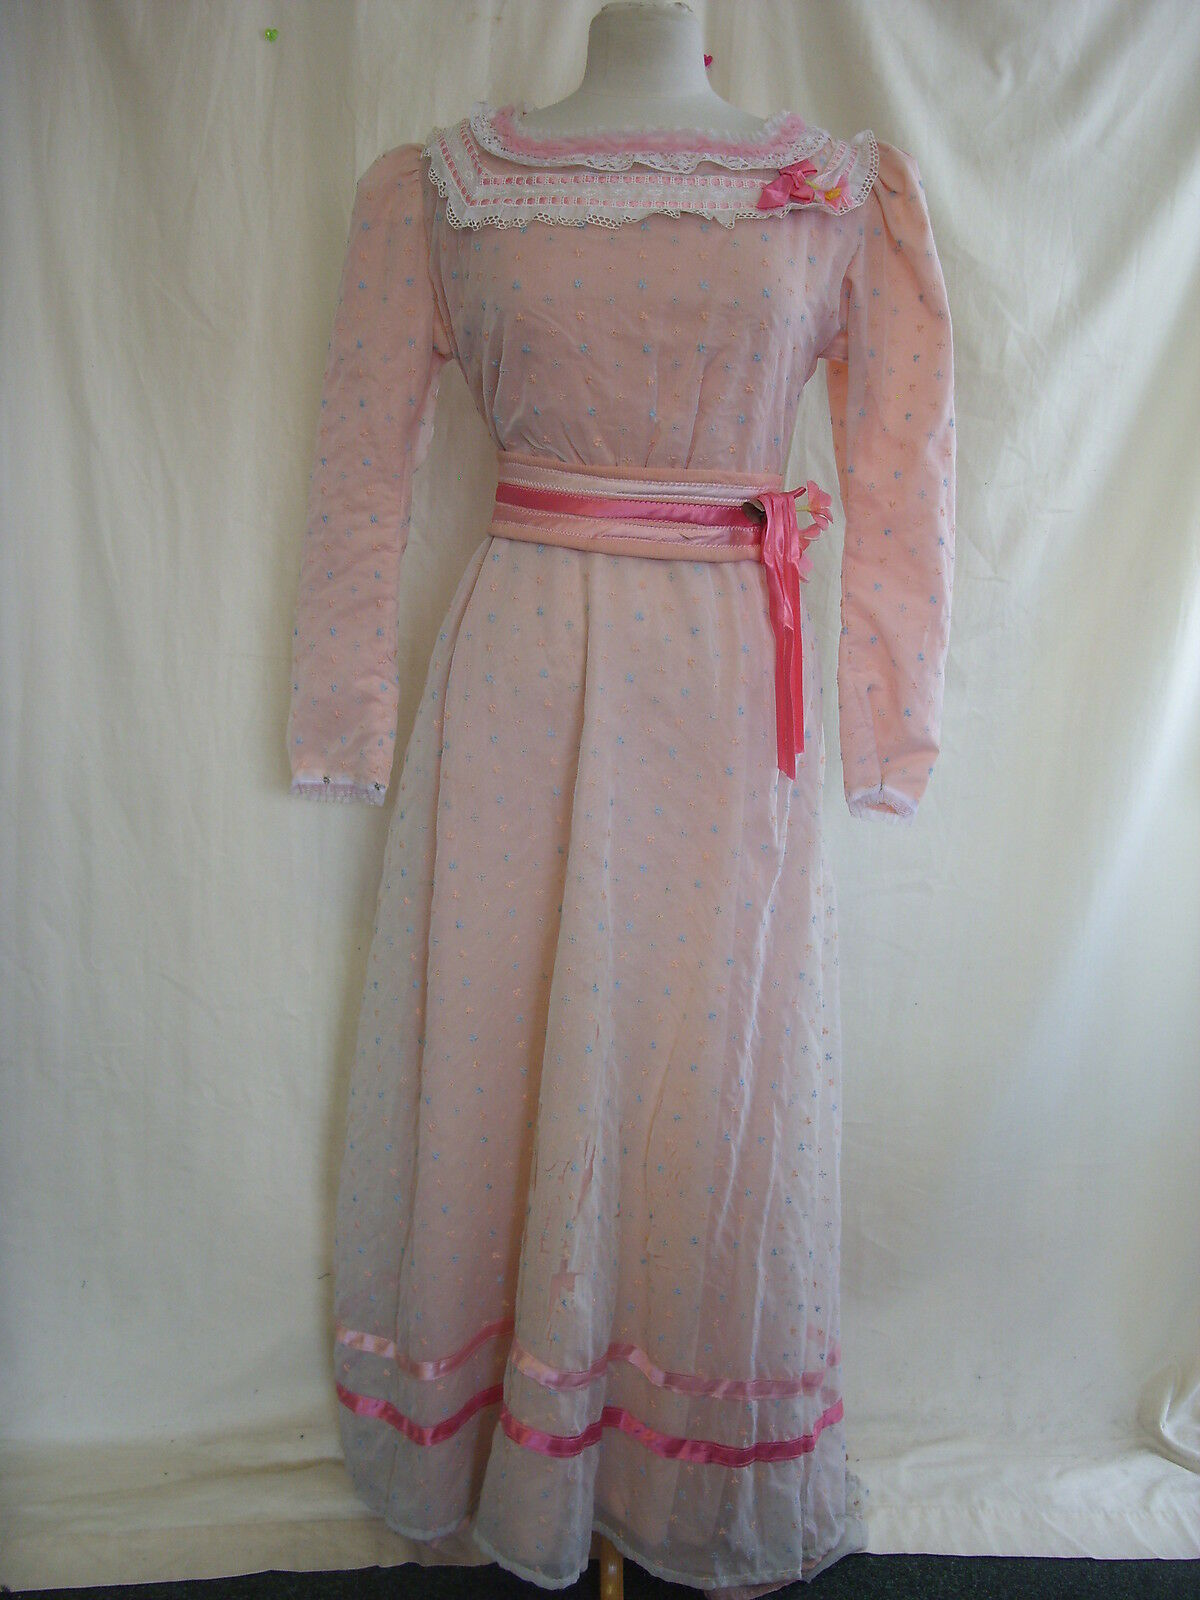 Womens Fancy Dress Outfit - 36